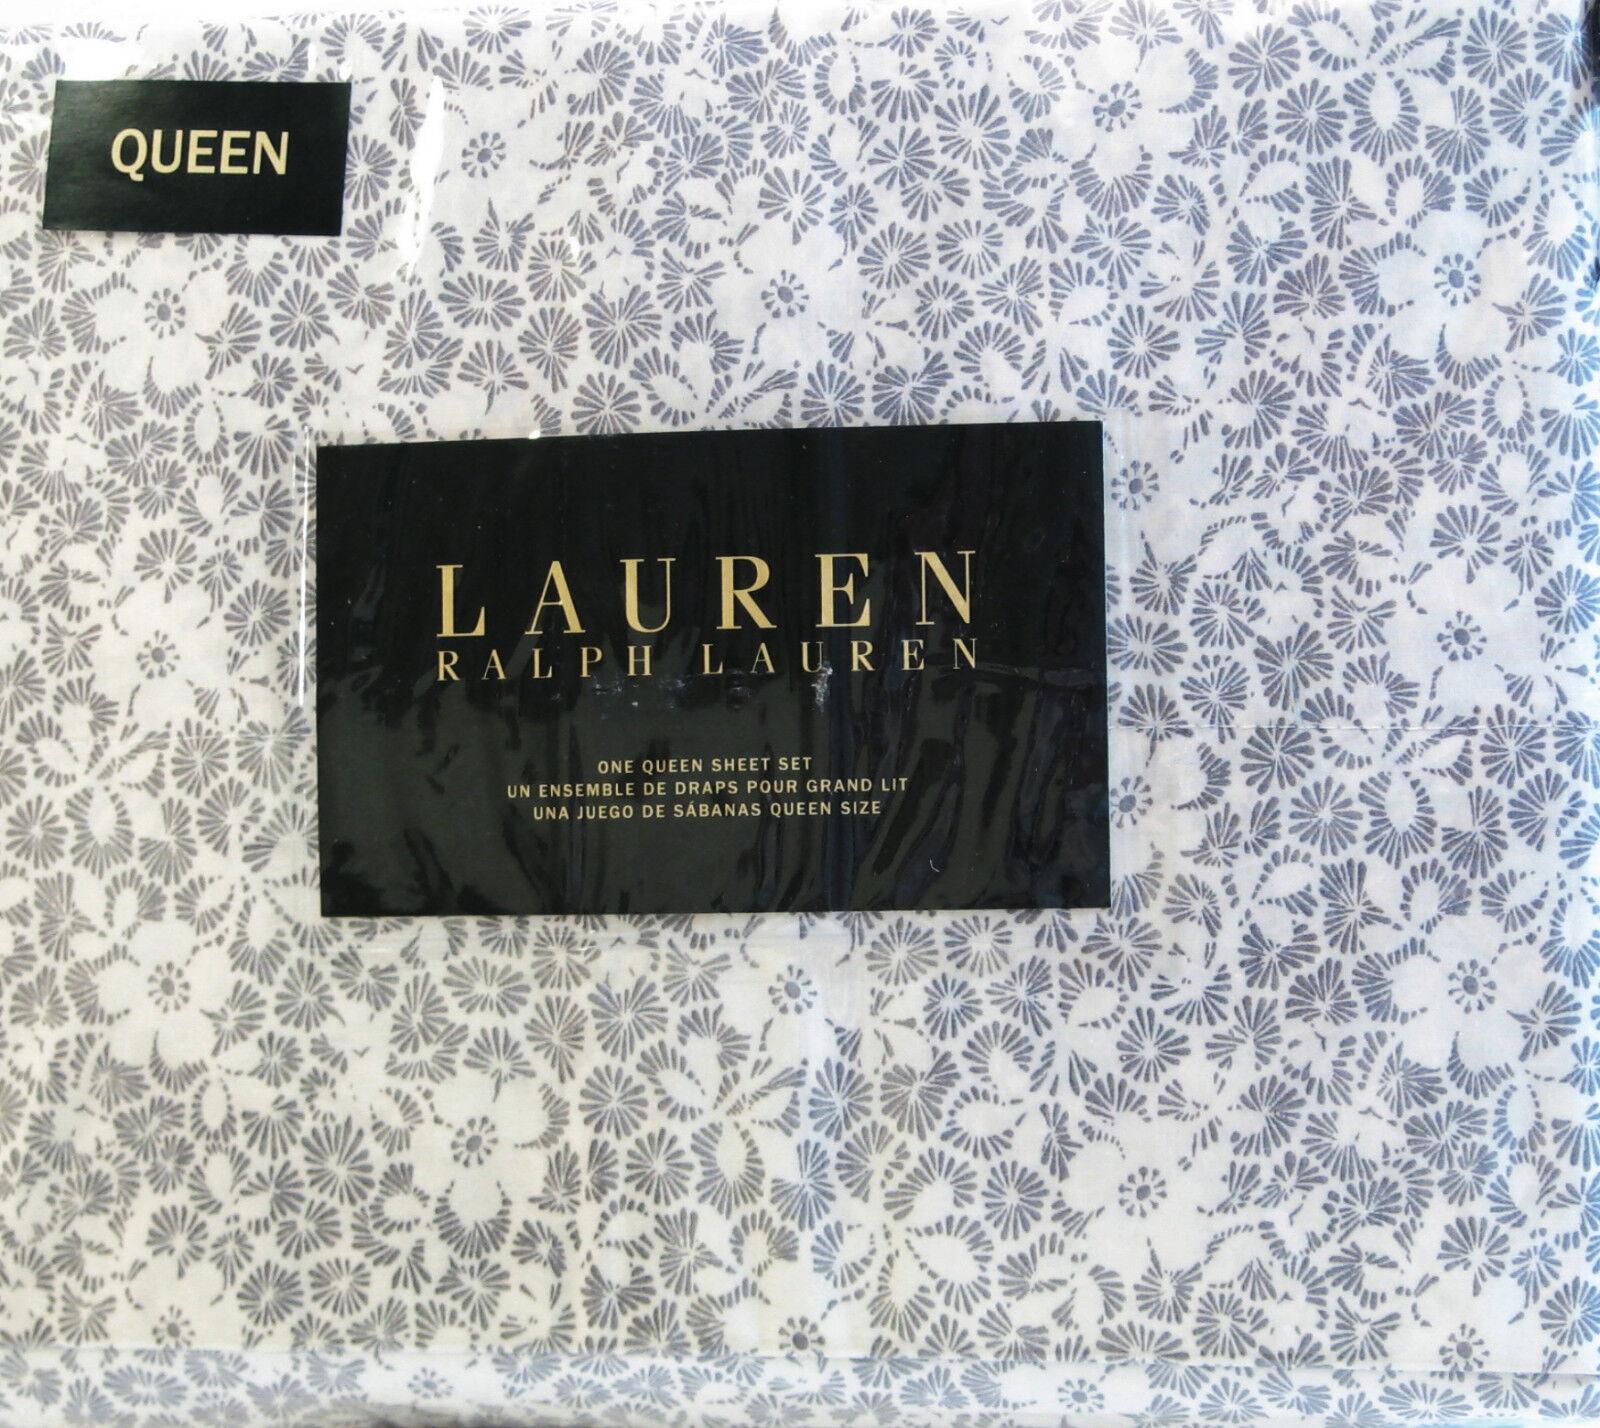 Ralph Lauren 4 PC Cotton Sheet Set Floral Charcoal grau Ivory Königin - NEW